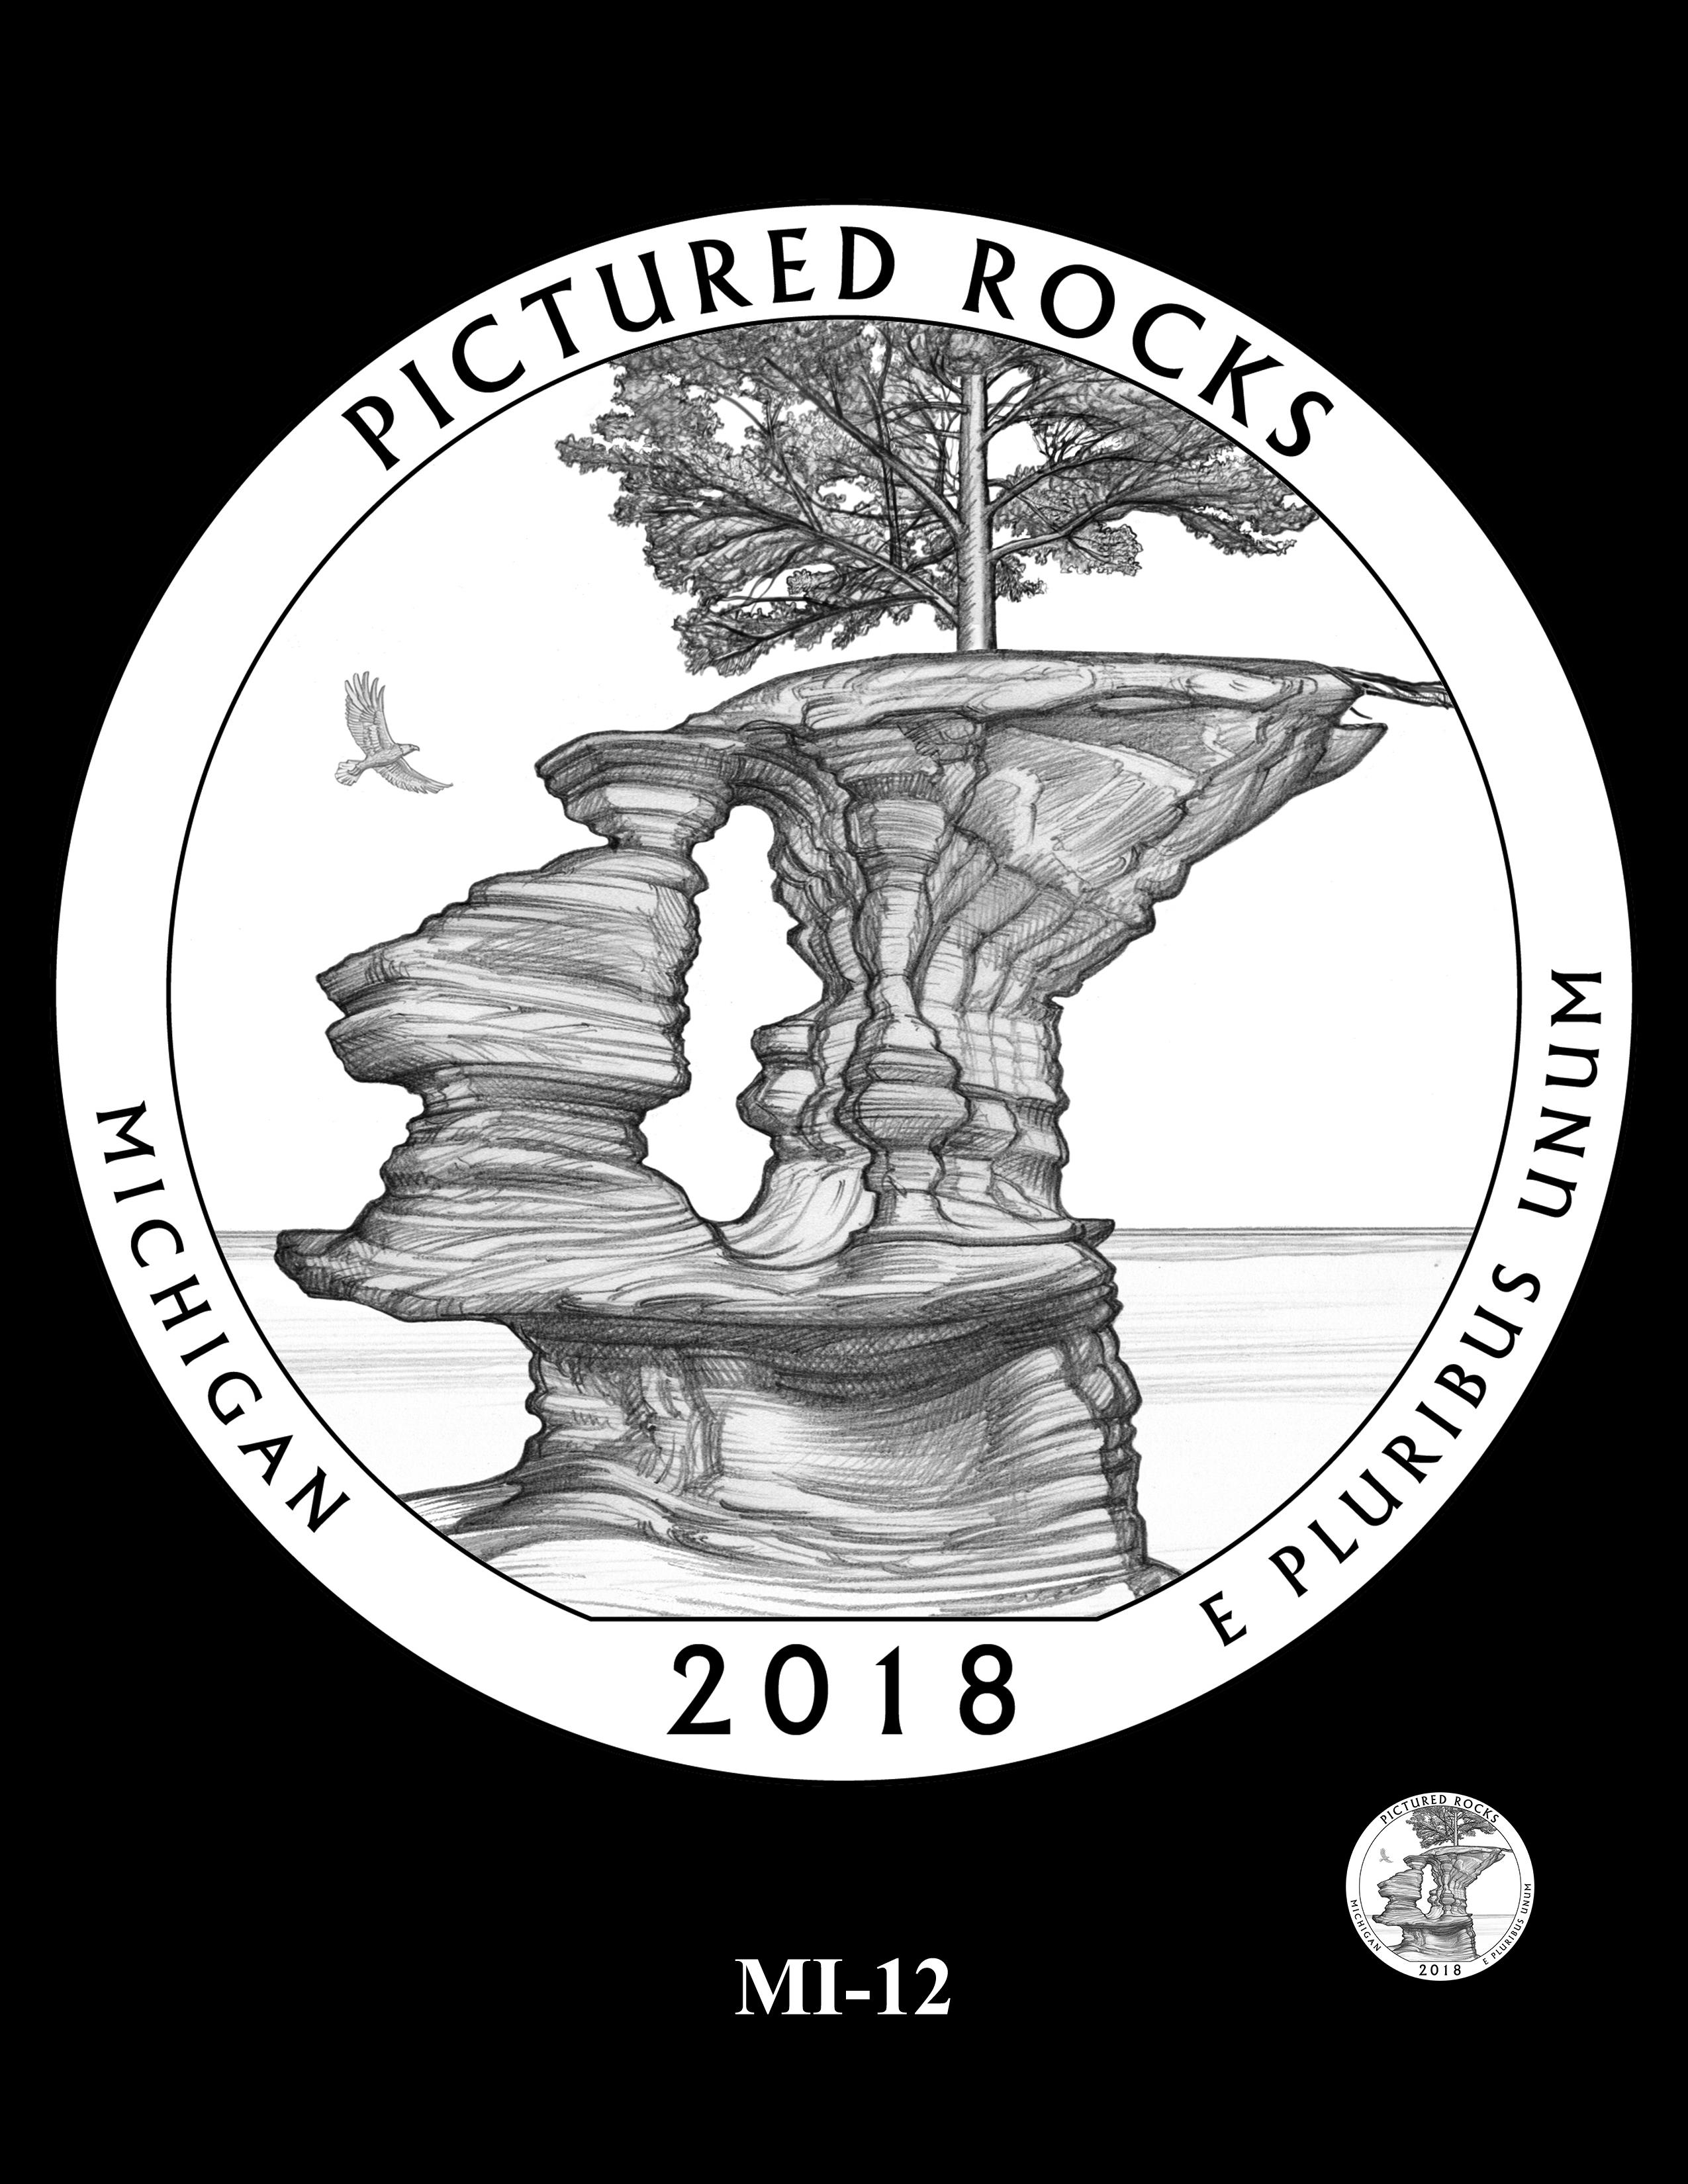 MI-12 -- 2018 America the Beautiful® Quarters Program